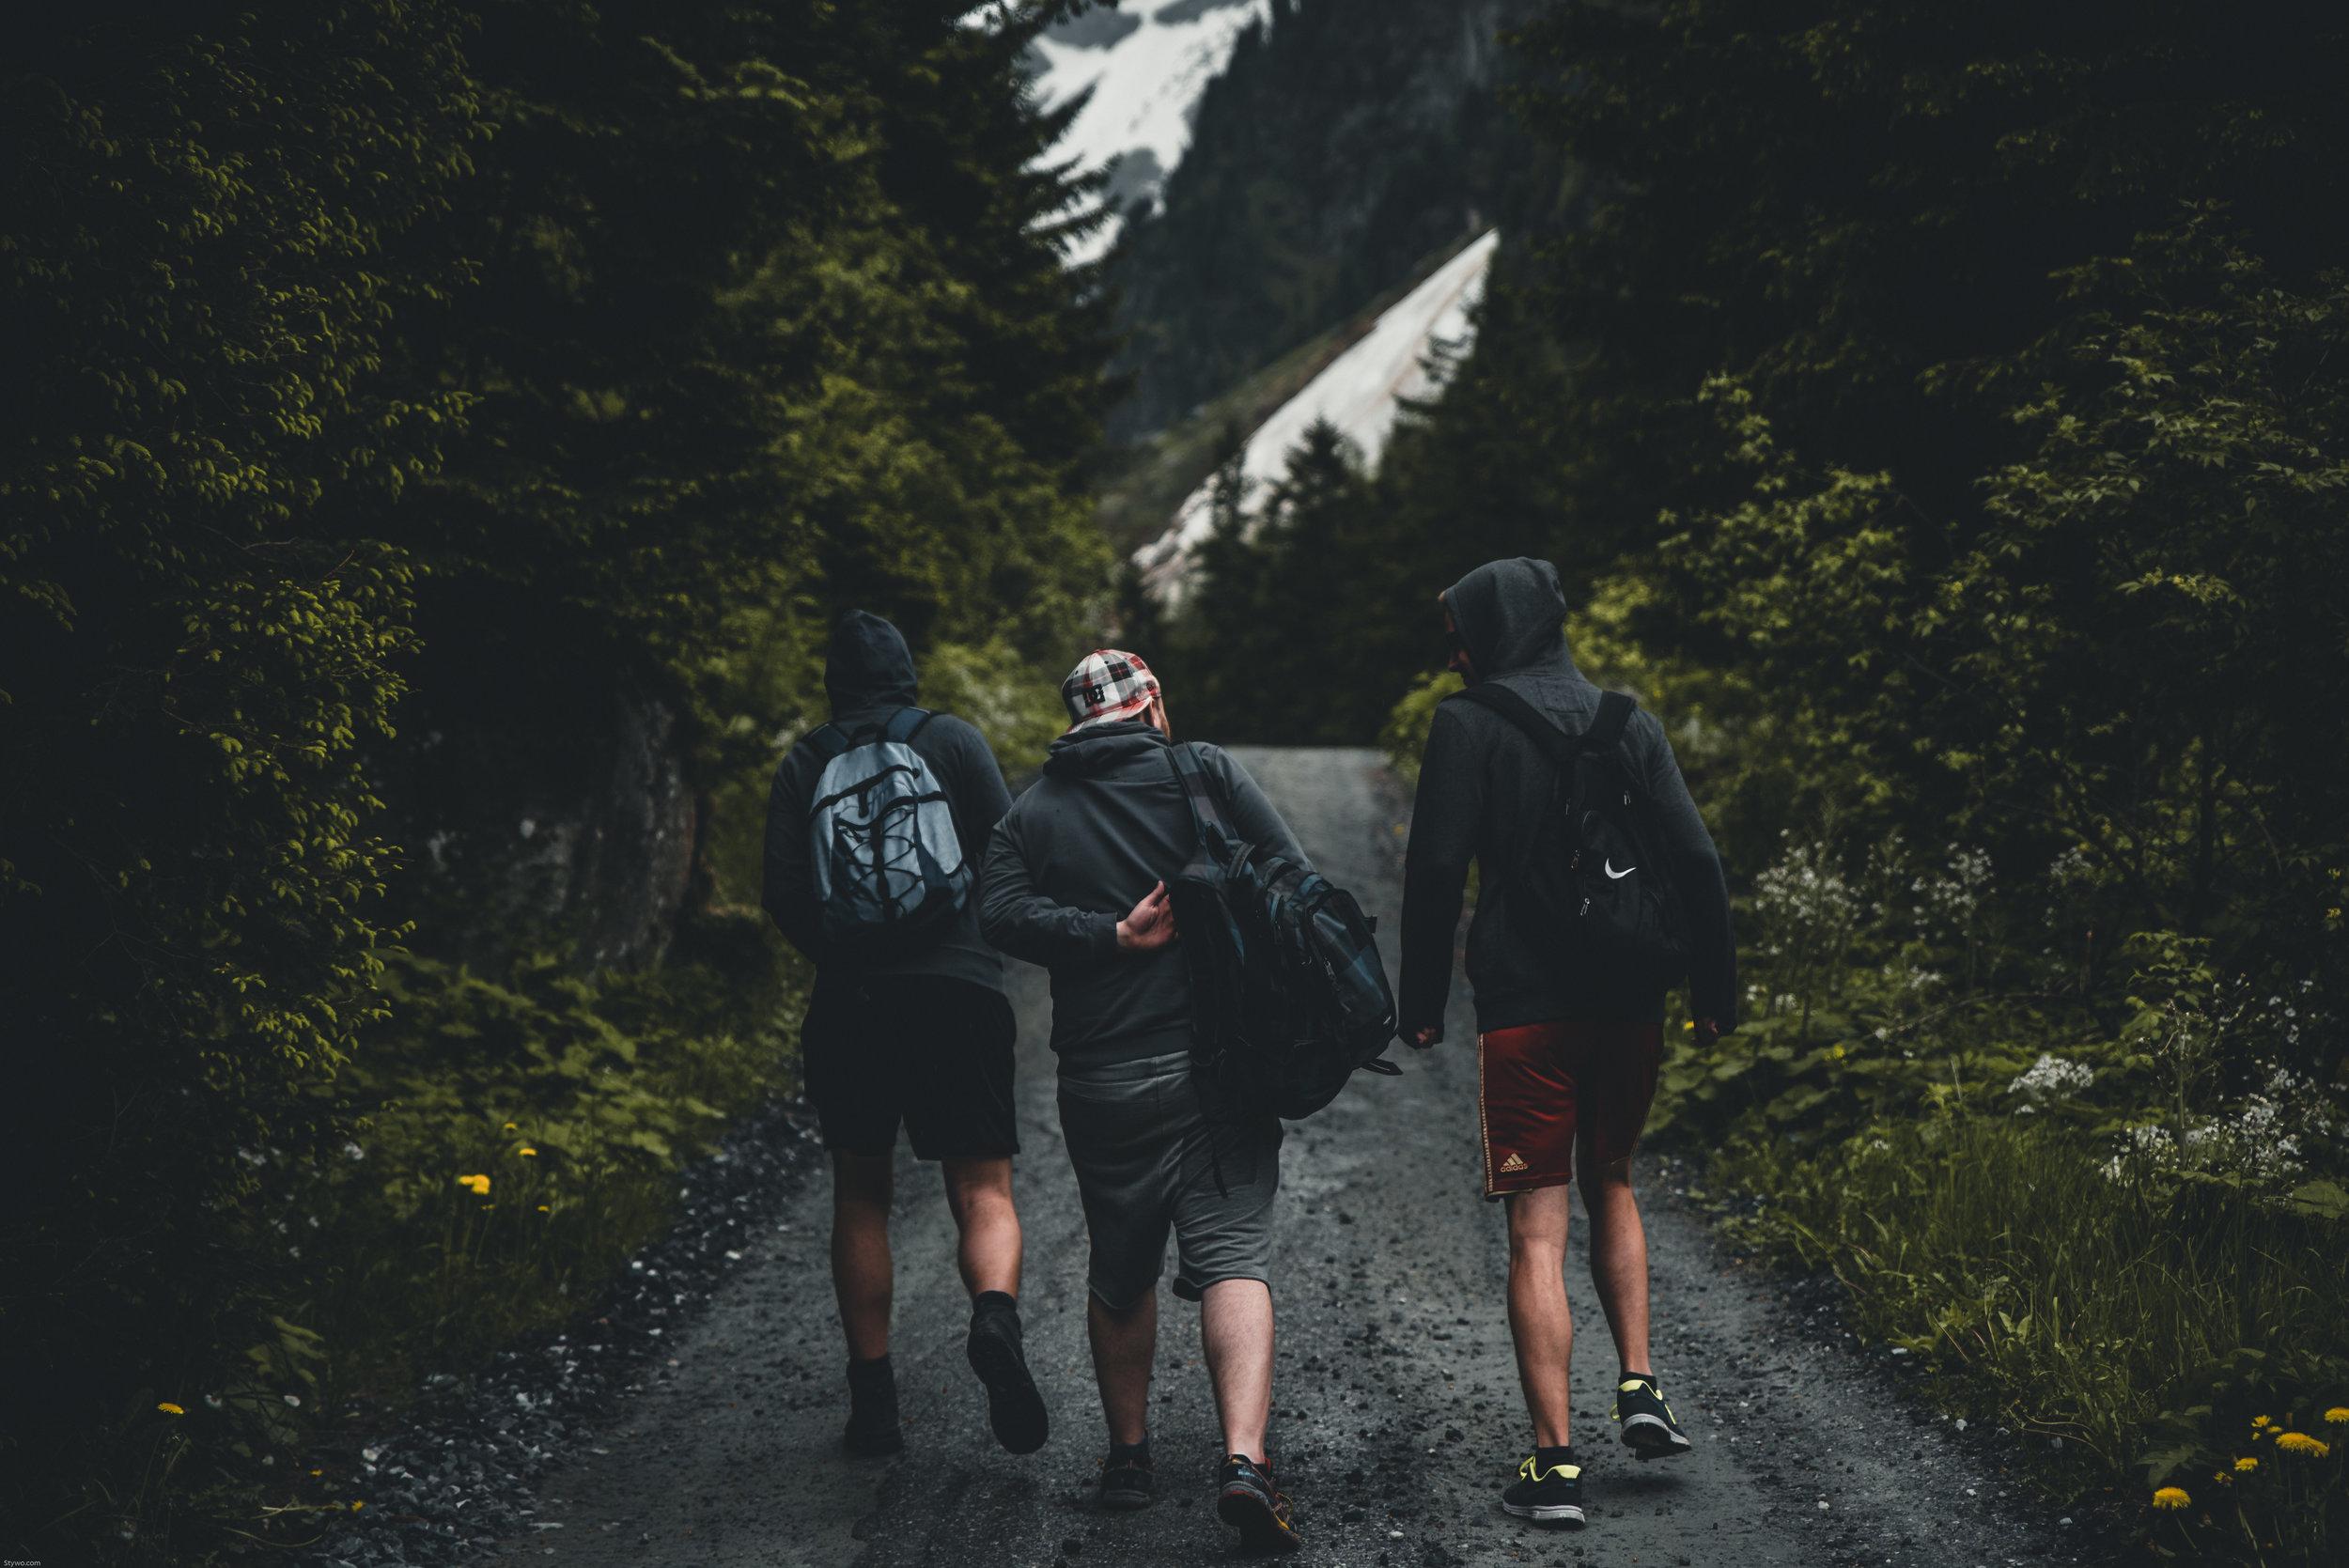 MEN'S LIFE GROUPS - Groups just for men.